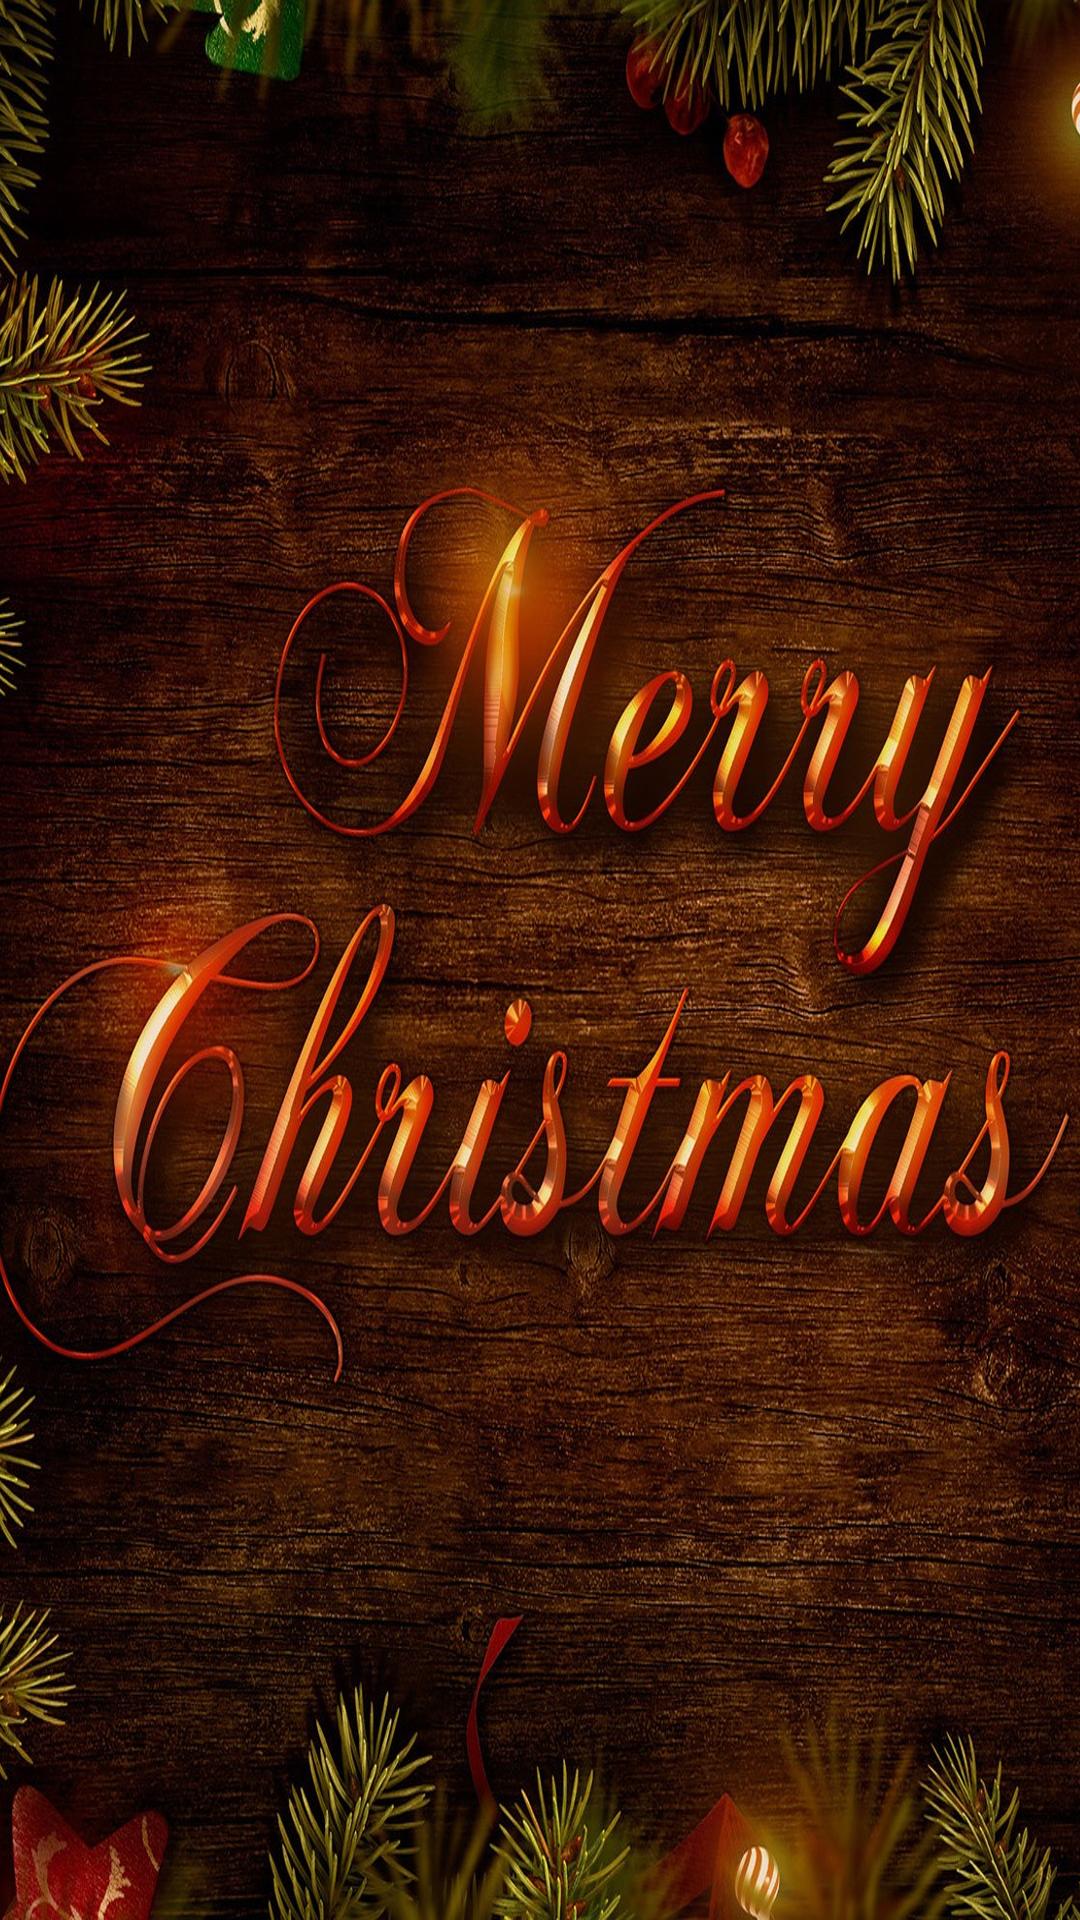 Merry Christmas Wallpaper For Iphone 1080x1920 Wallpaper Teahub Io